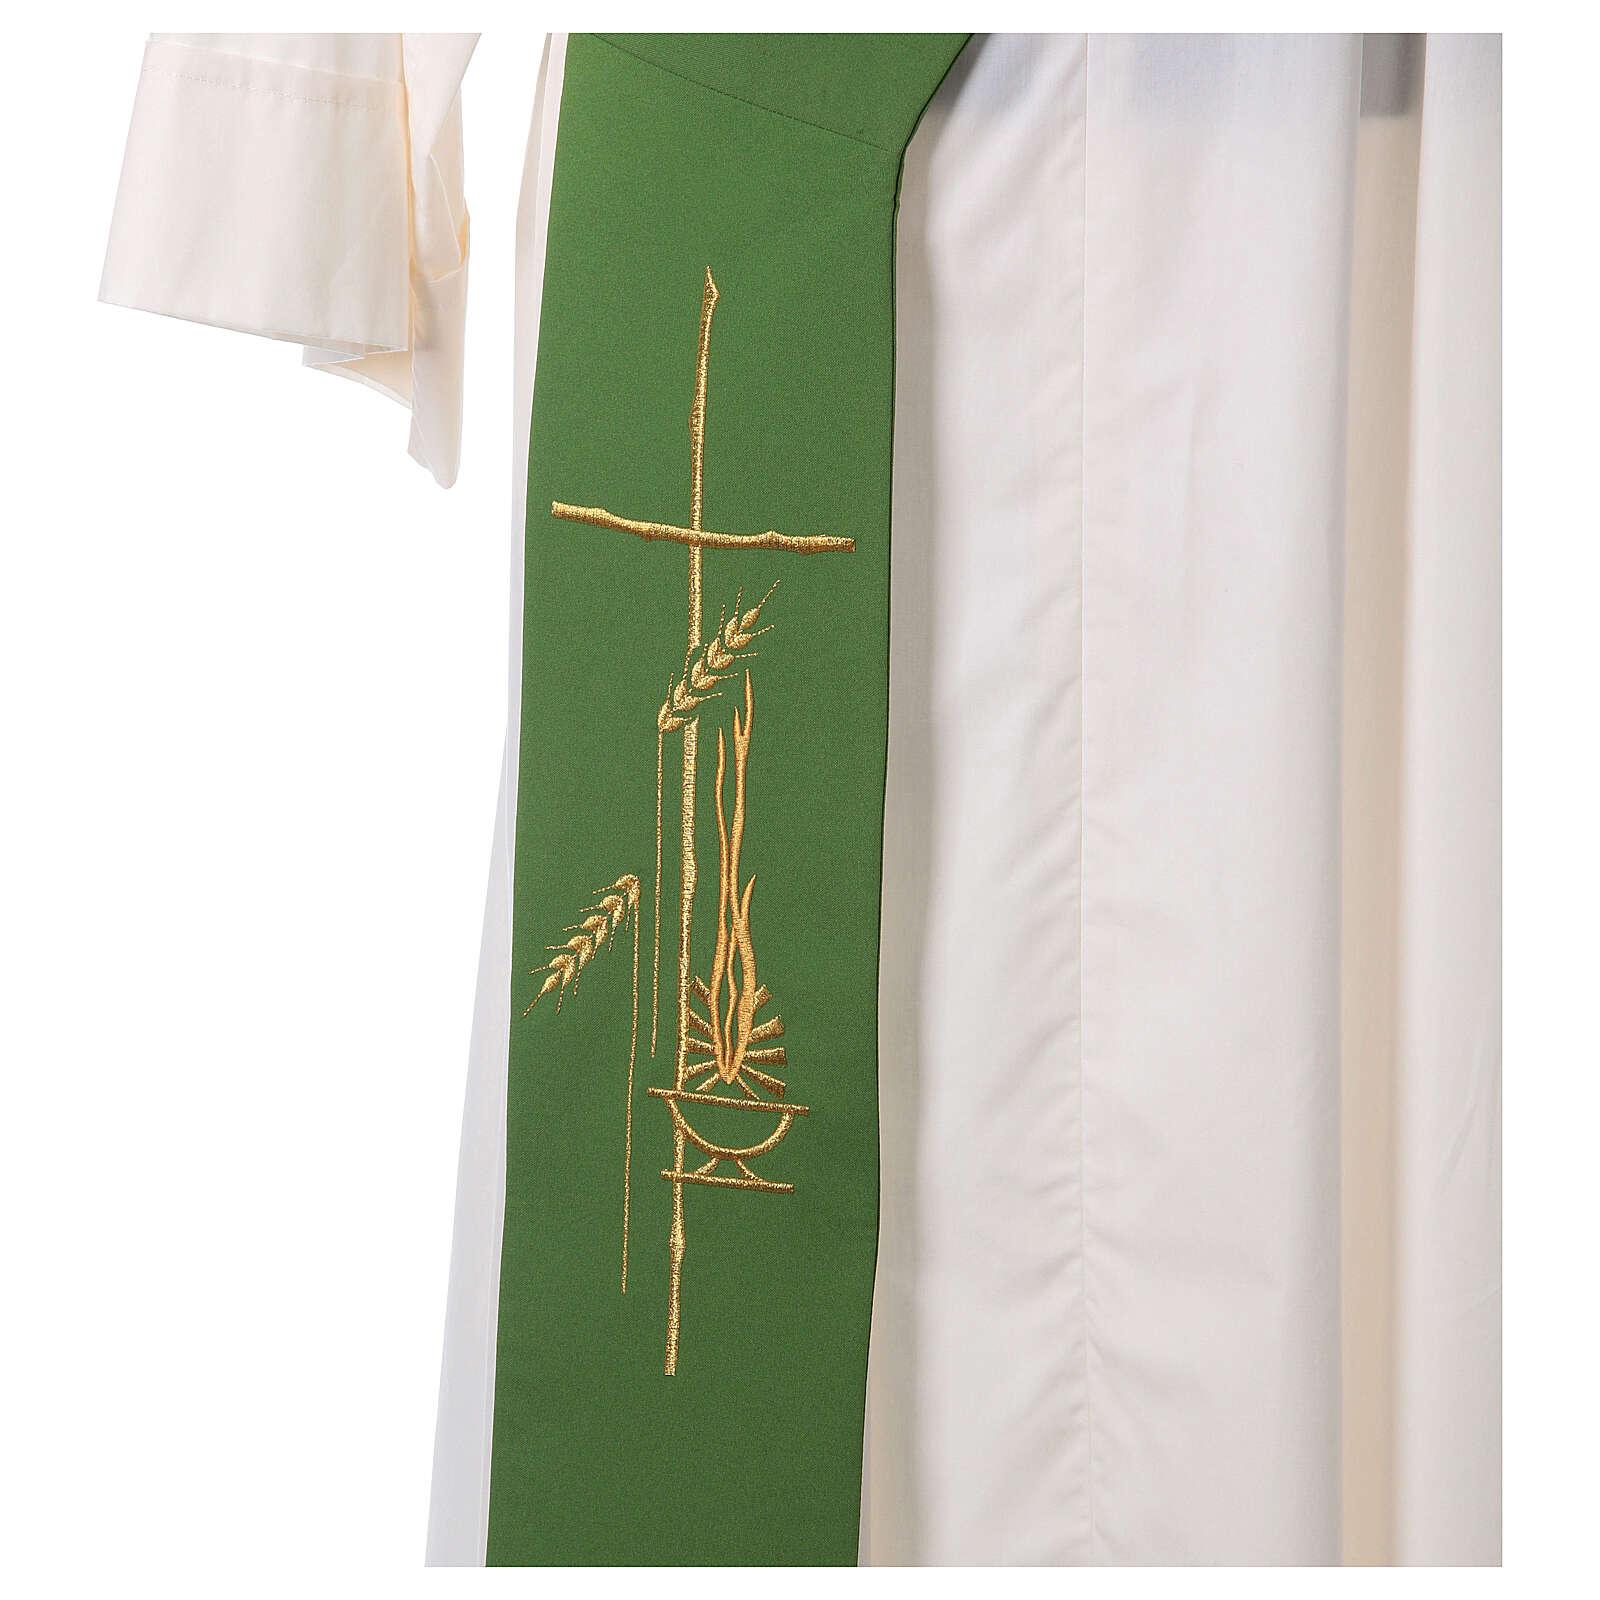 Stola diaconale 100% poliestere lampada croce spighe 4